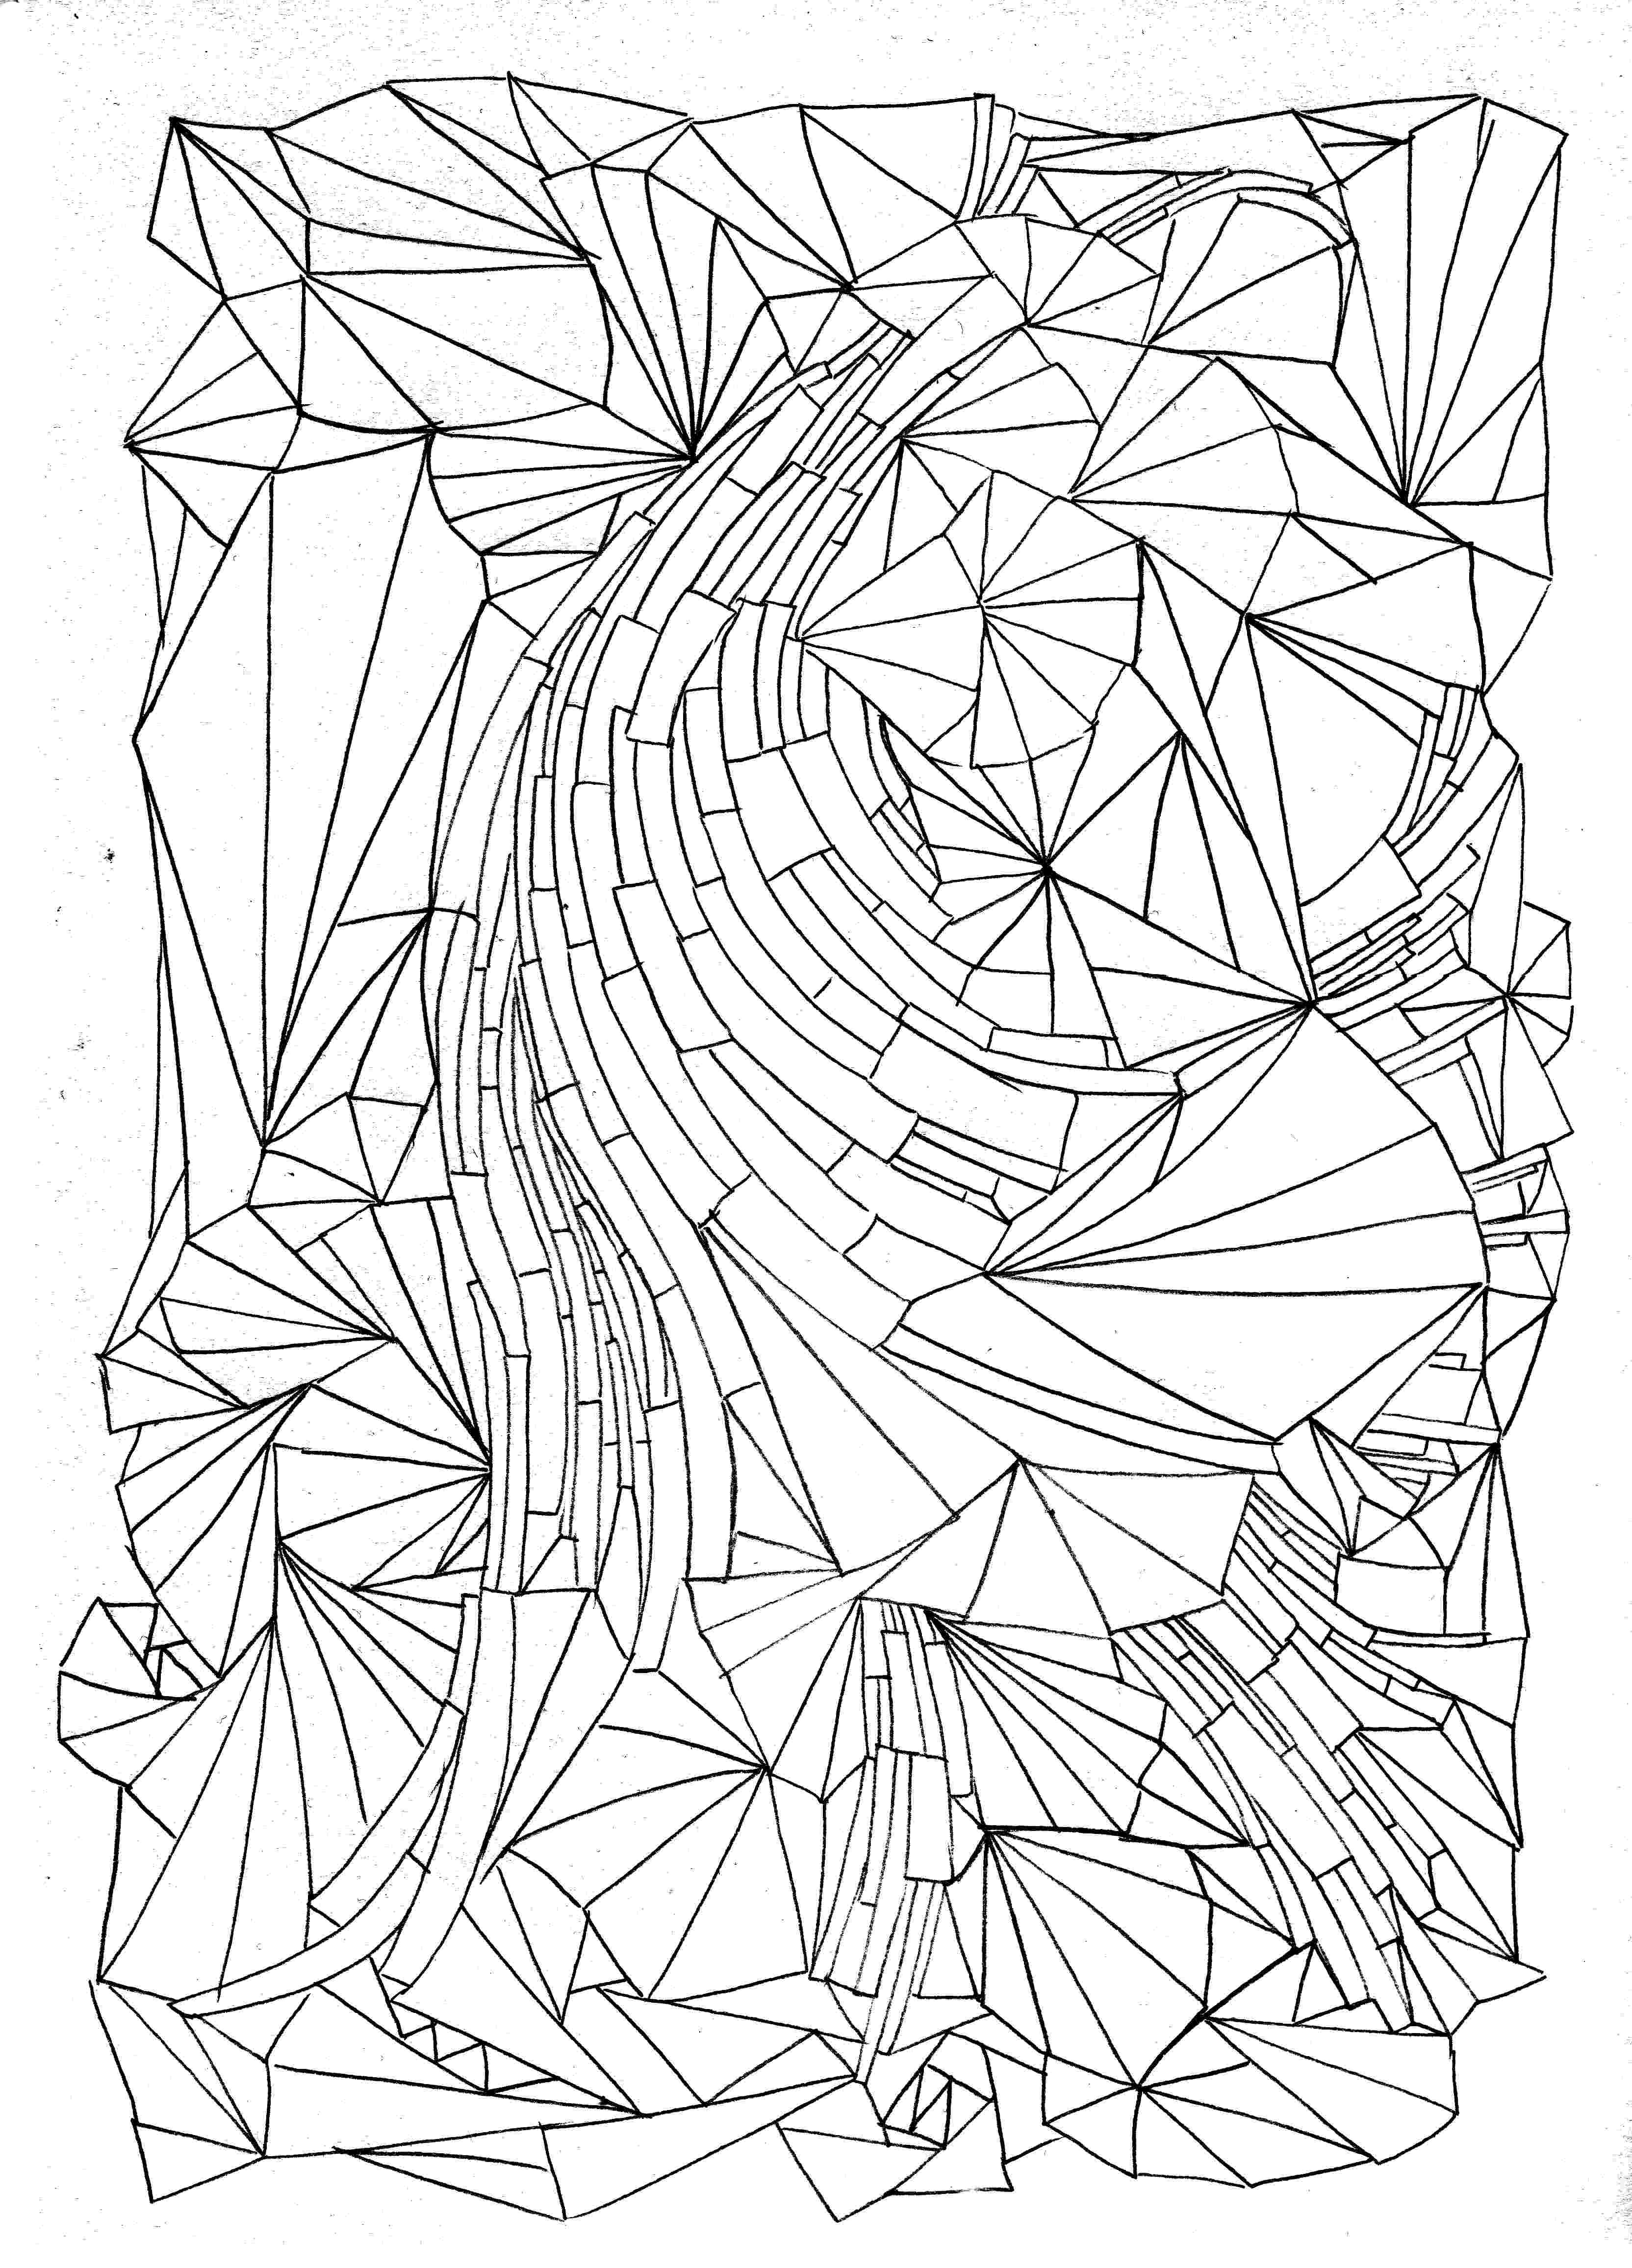 pattern coloring sheets free printable geometric coloring pages for adults pattern sheets coloring